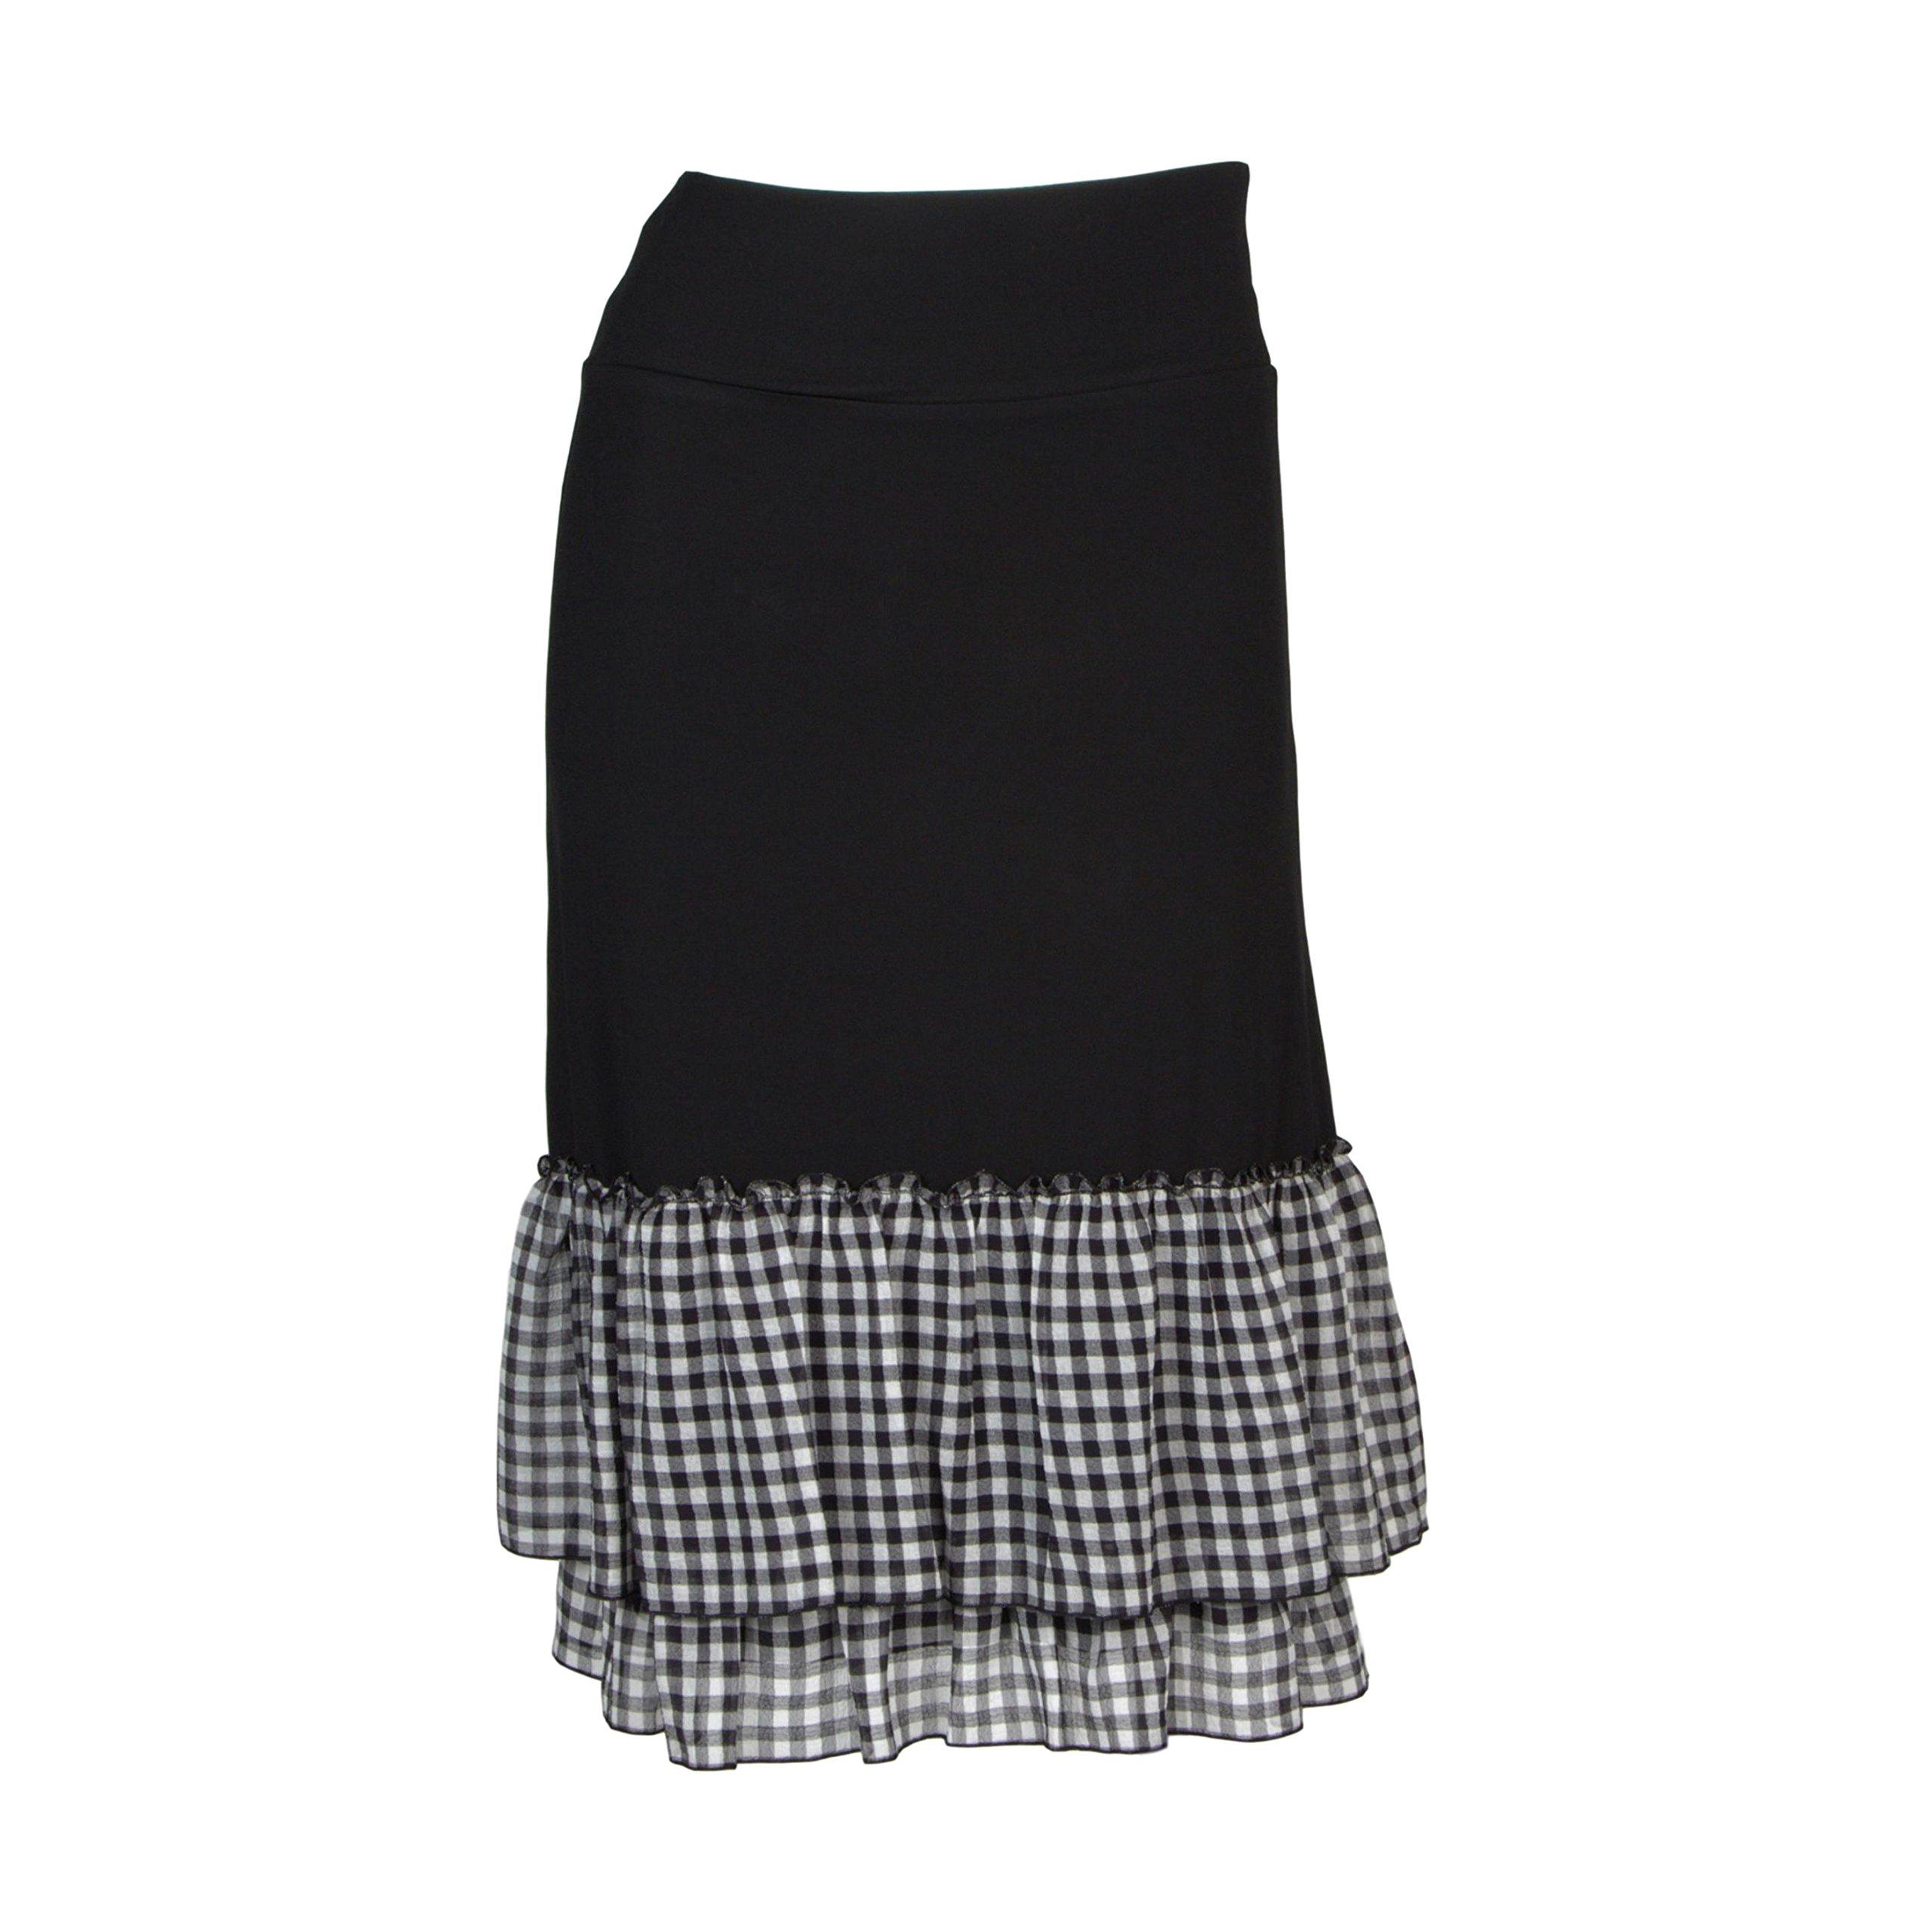 Peekaboo-Chic Cottage Check Half Slip Skirt Extender (Black, l/XL)